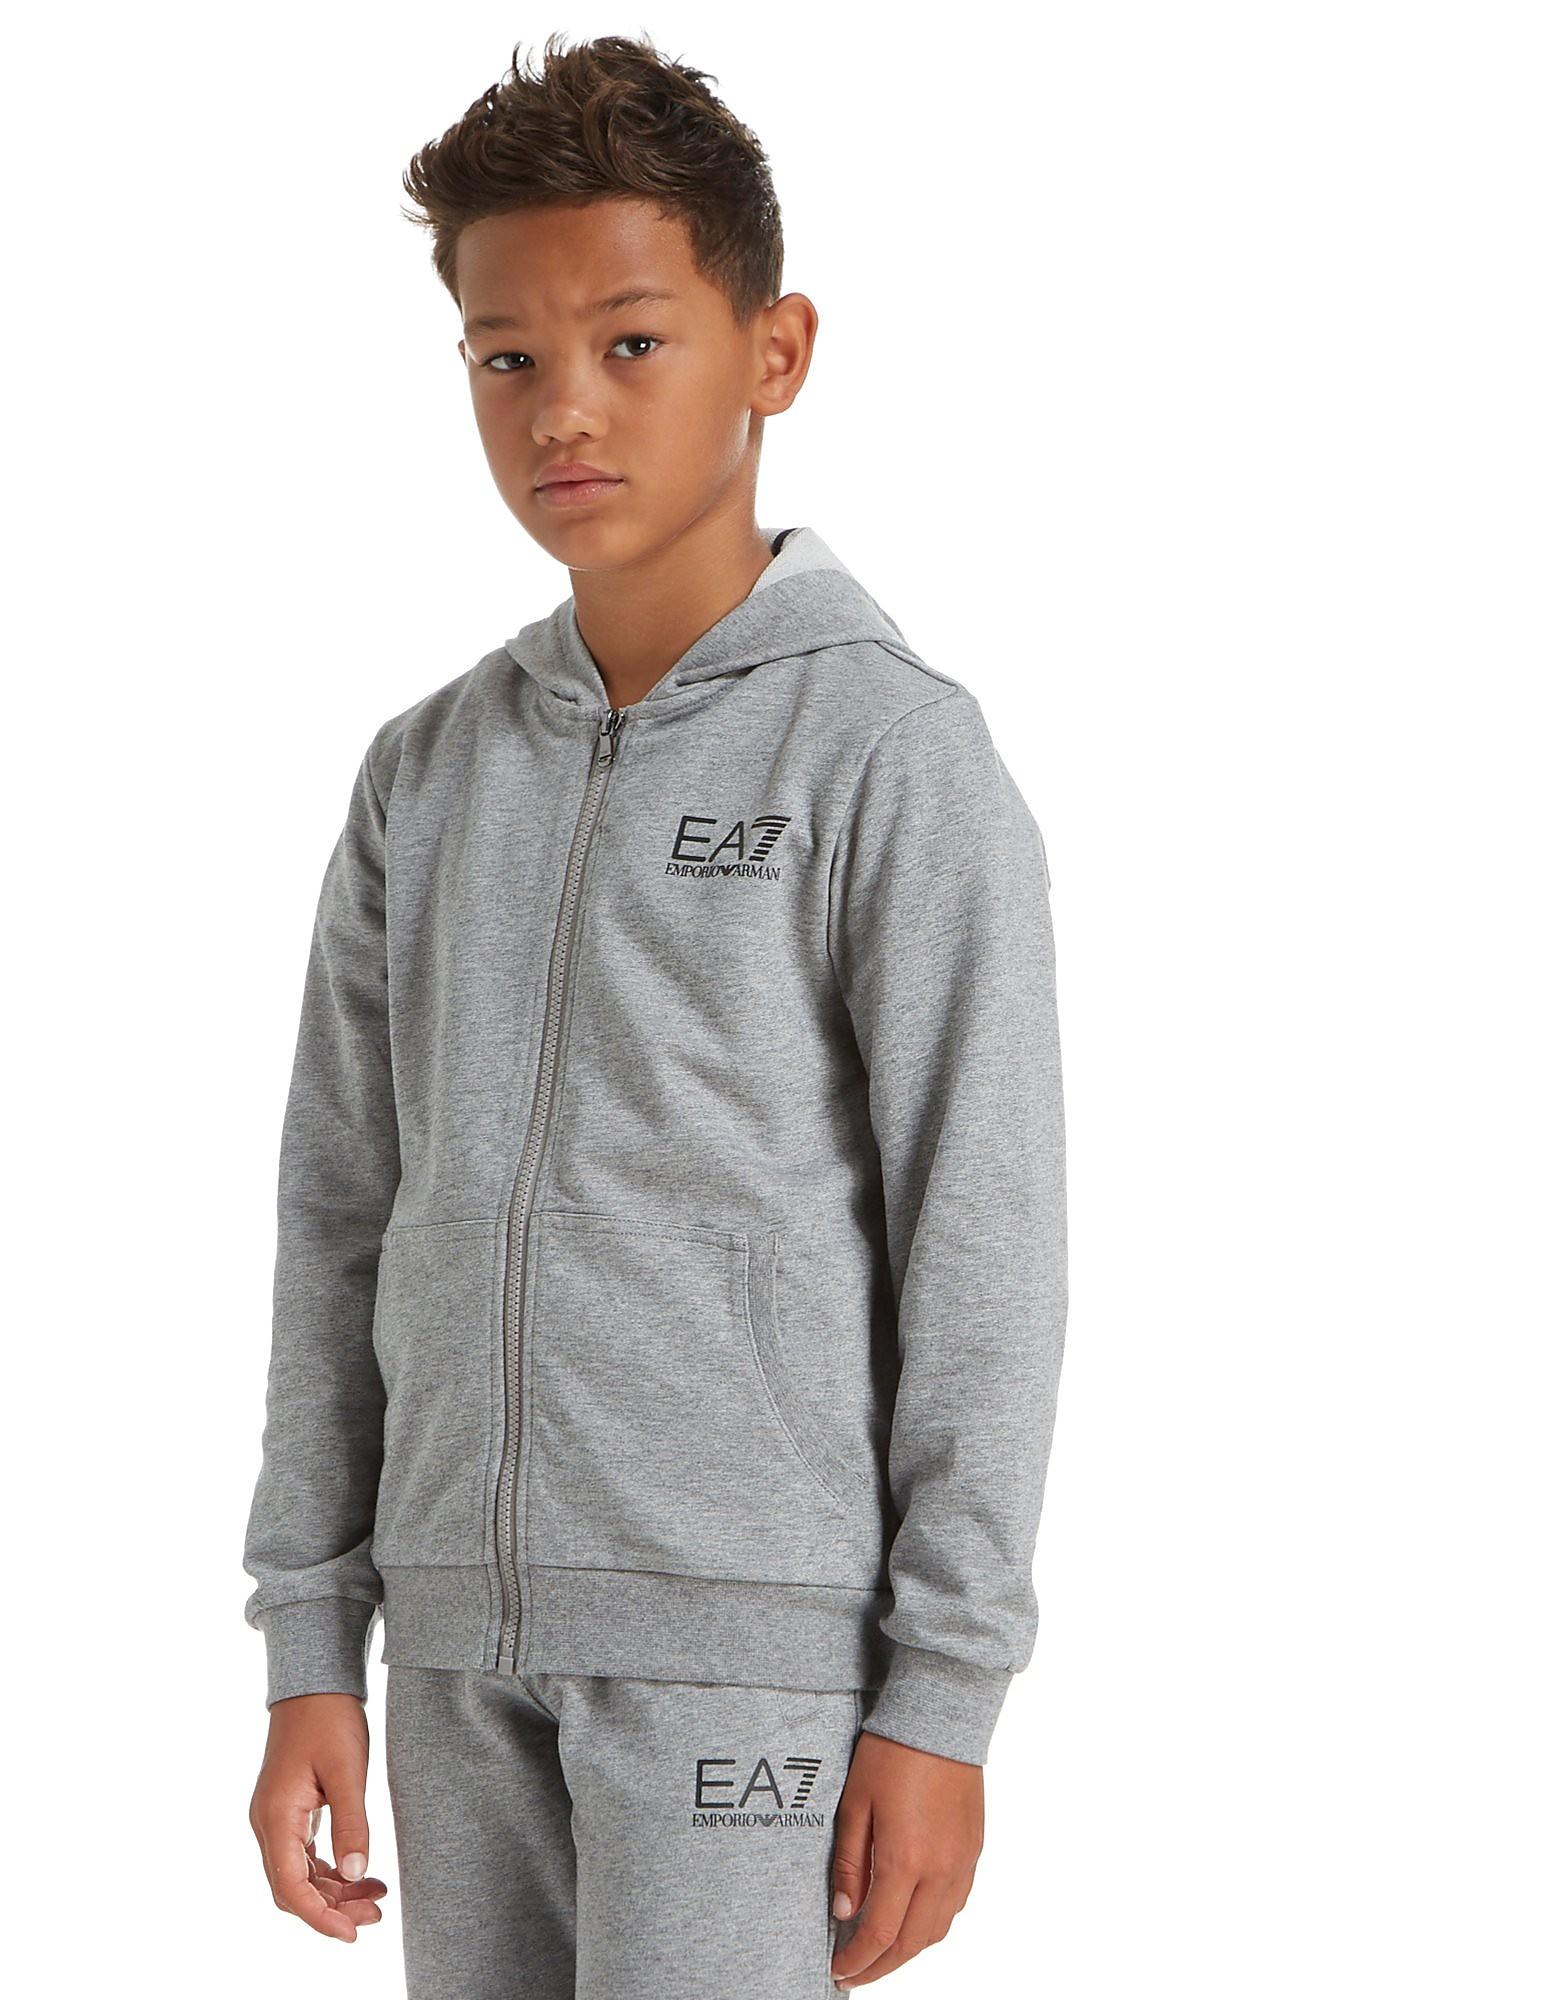 Emporio Armani EA7 Core Full Zip Hoodie Junior